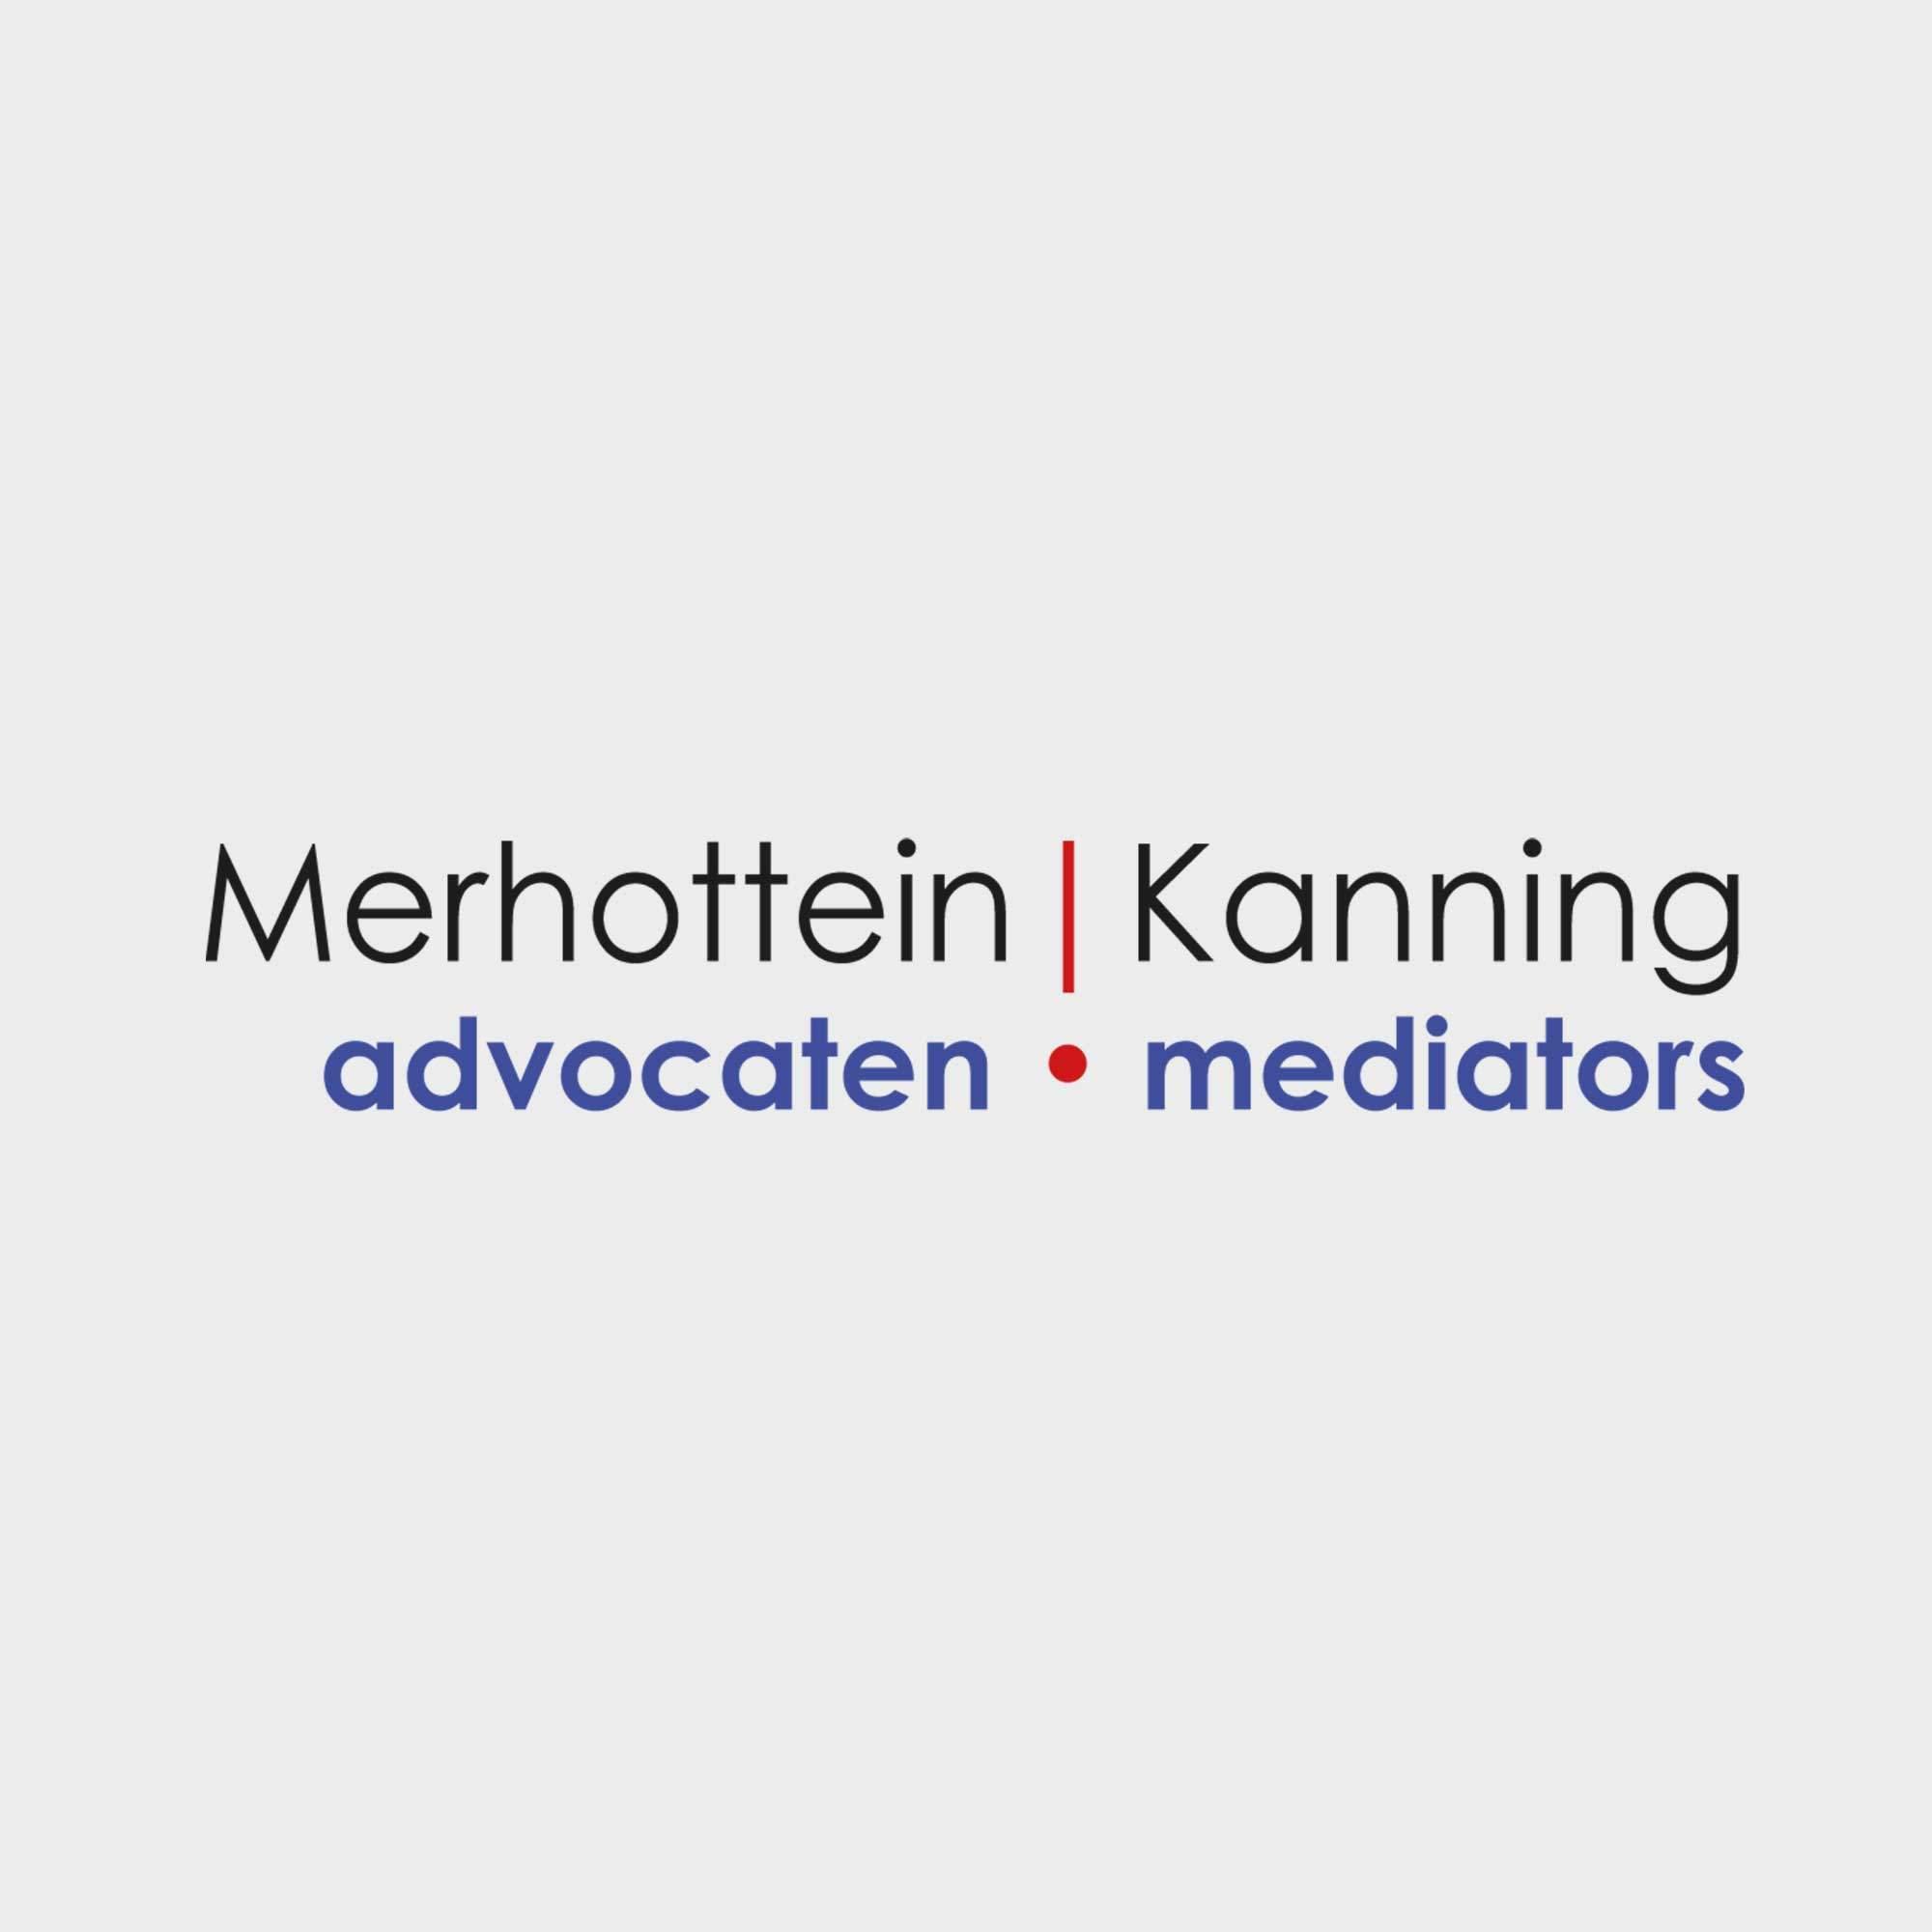 mk-advocaten-online-marketing-bureau-webdevelopment-haarlem-made-marketing-5